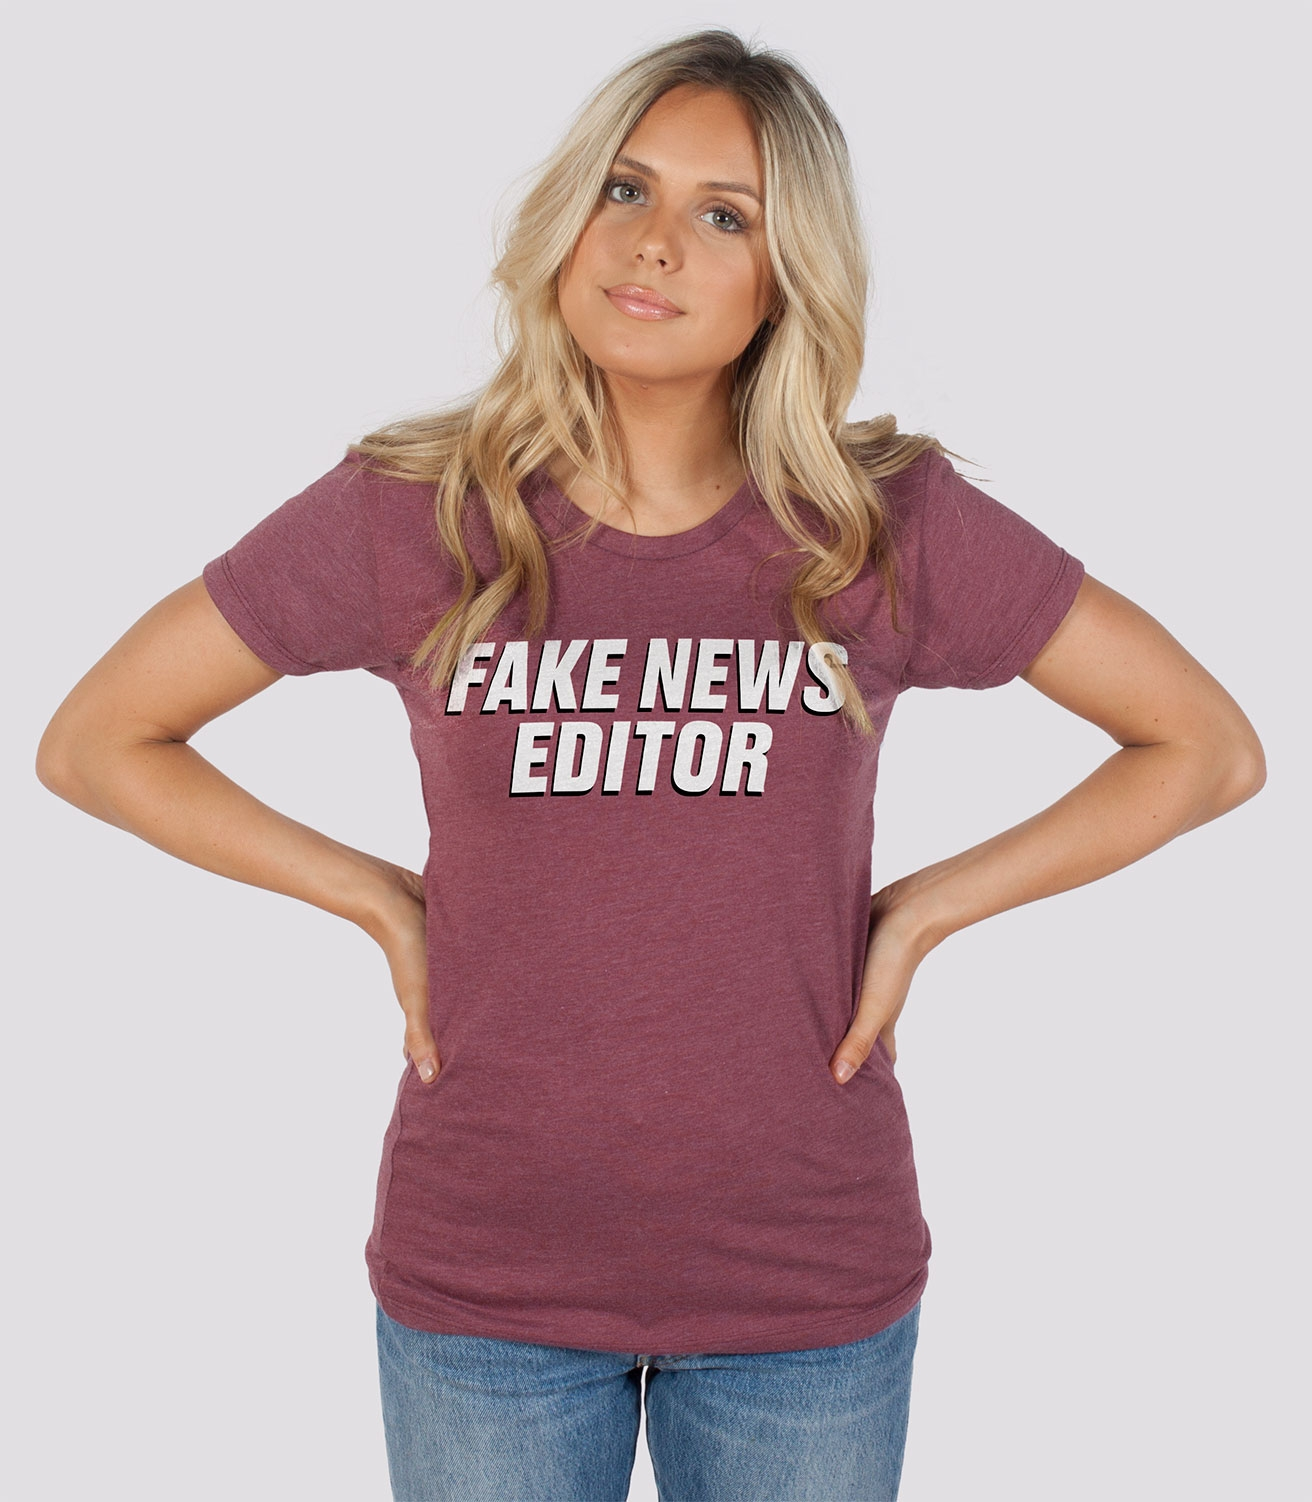 5e0203386b790 Fake News Editor